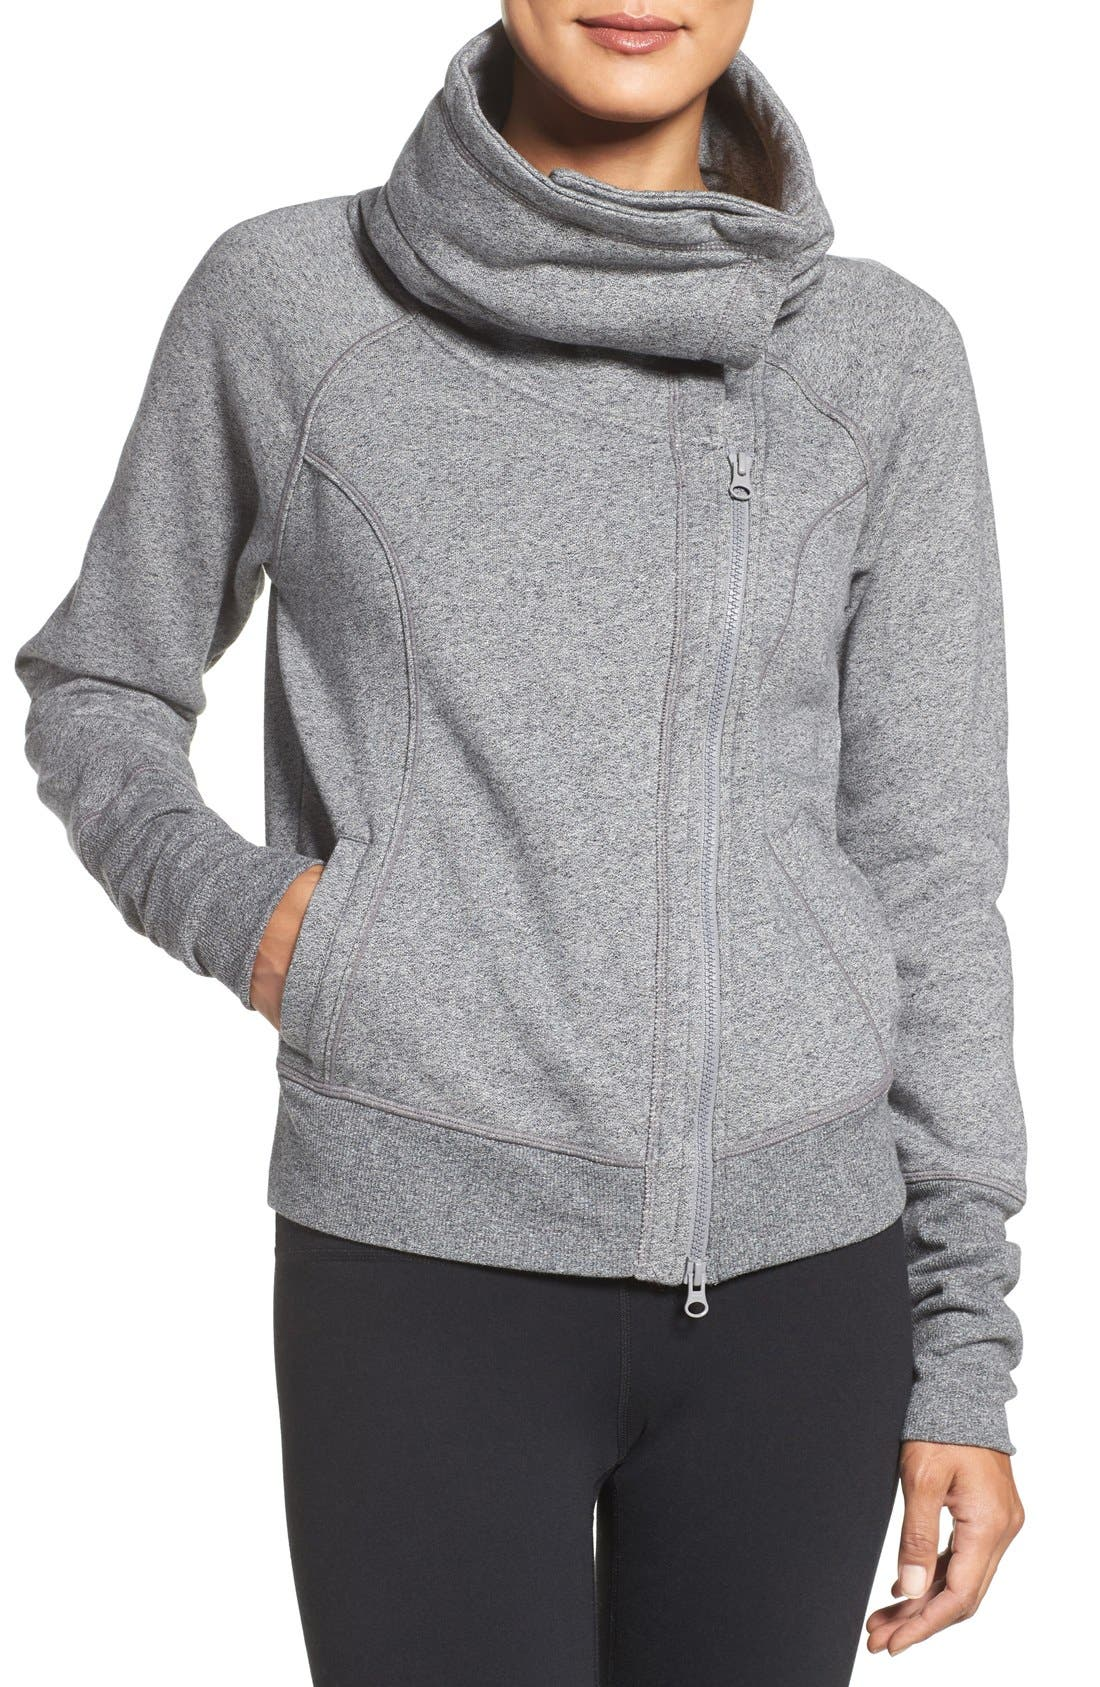 Into Balance Jacket,                         Main,                         color, Grey Blizzard Heather